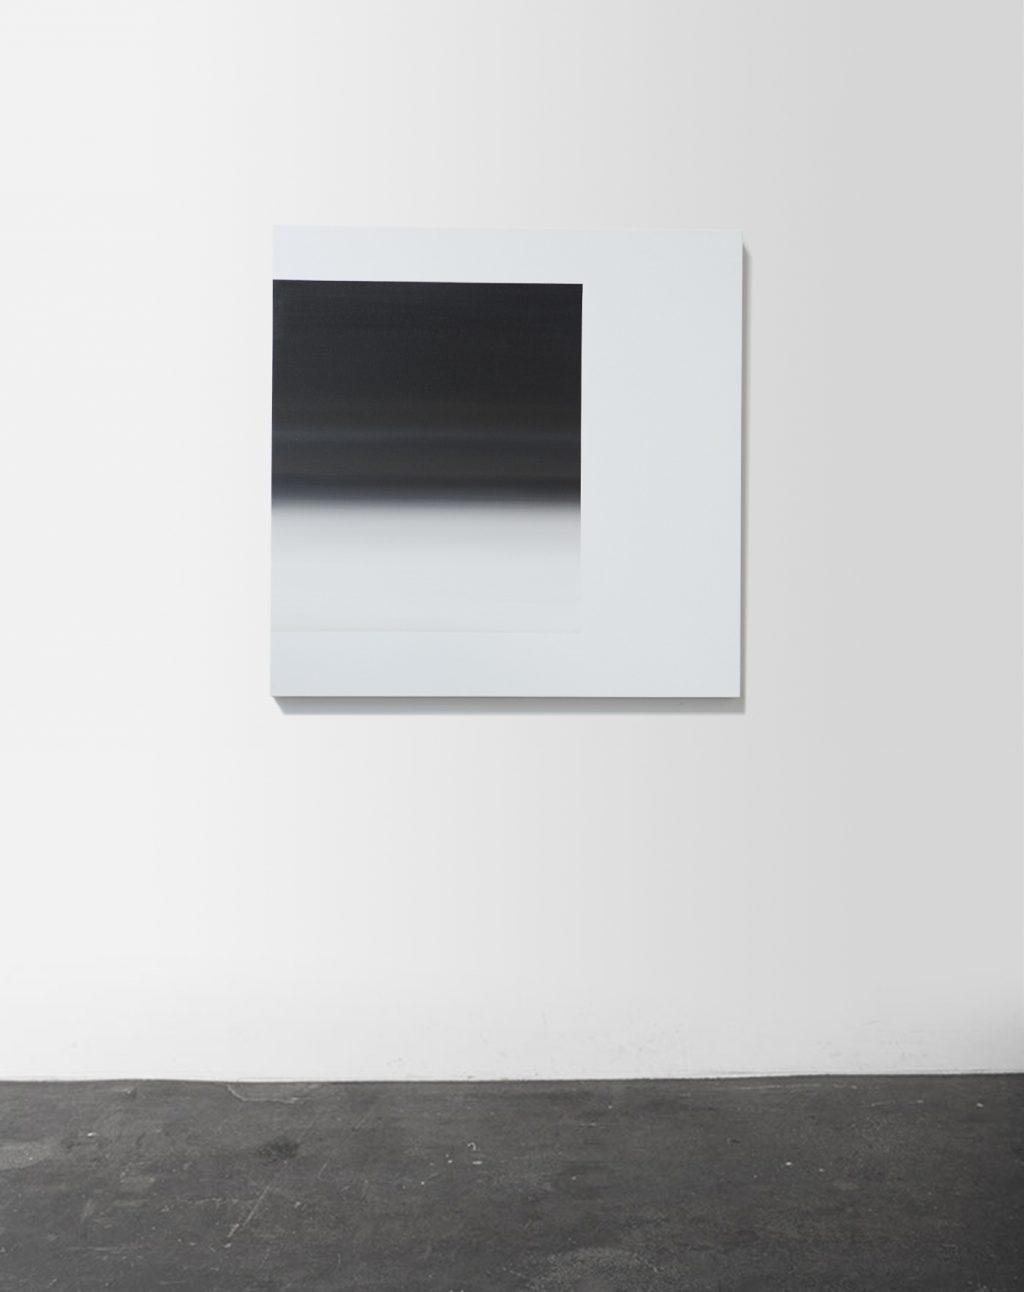 Untitled #13 – 2017